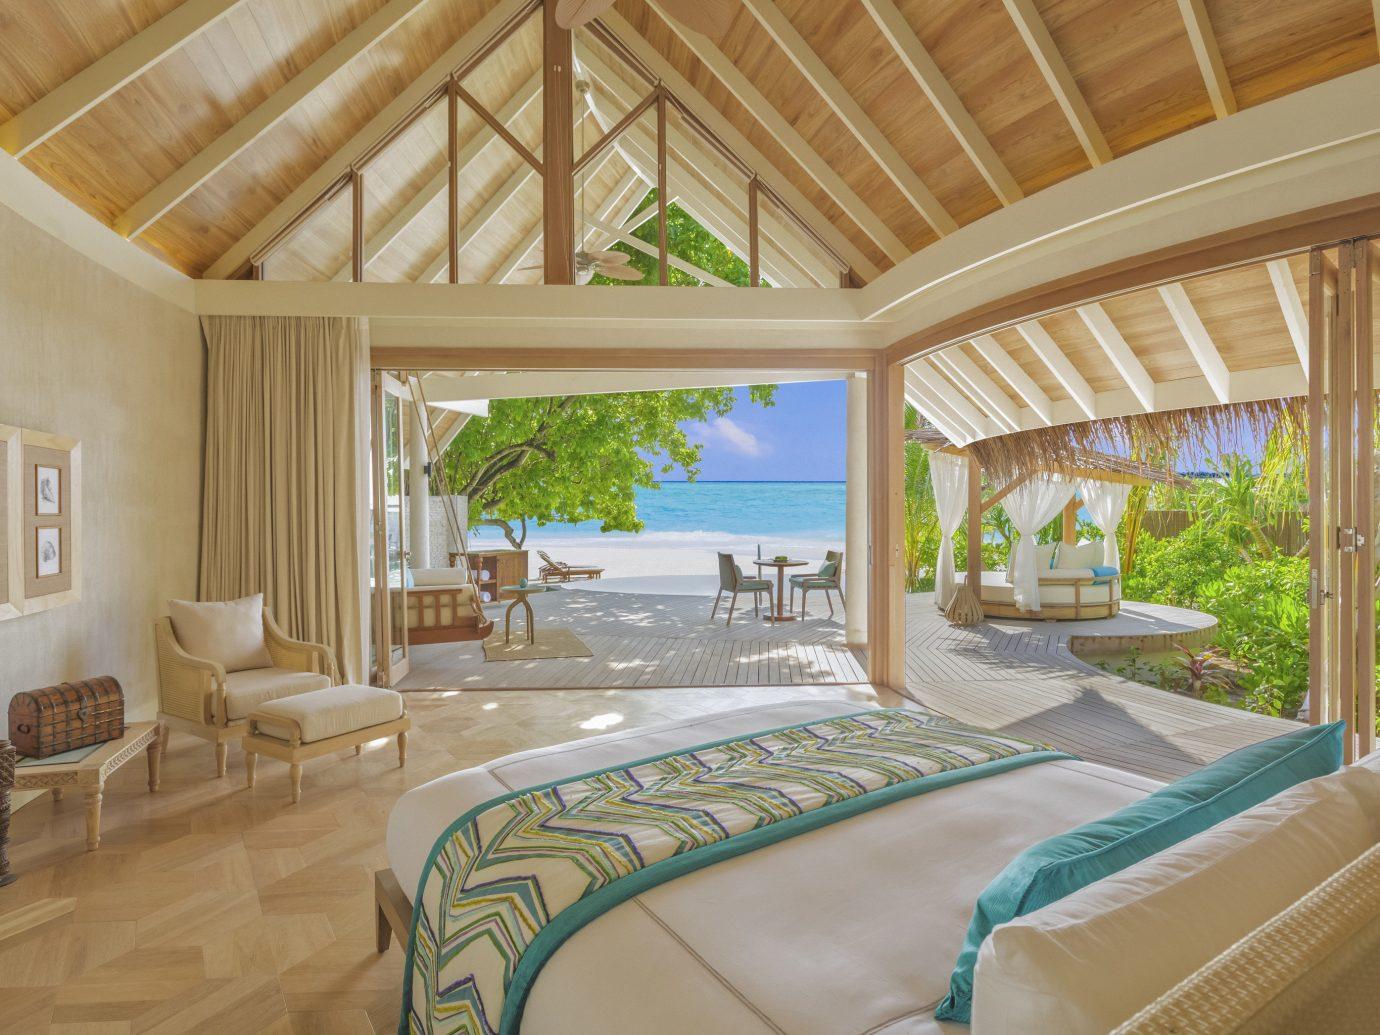 Bedroom at Milaidhoo Island Maldives